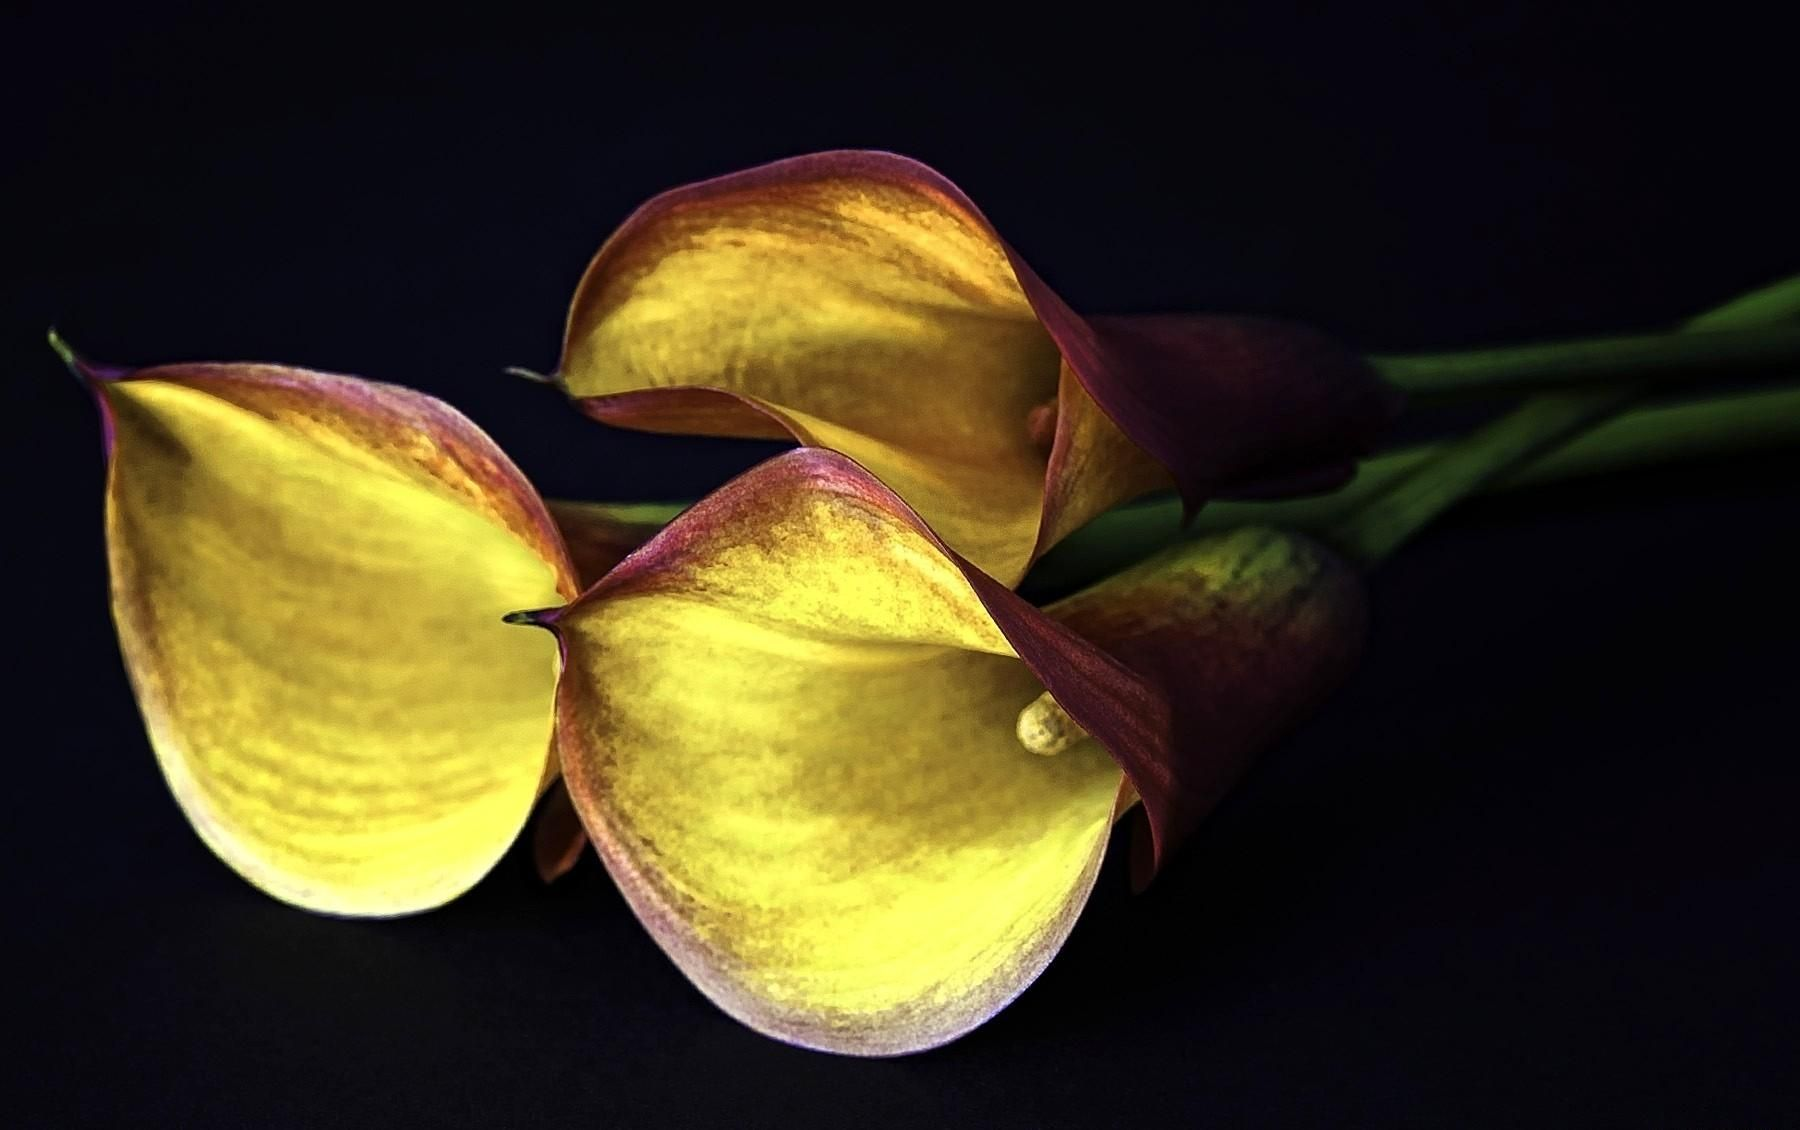 1800x1130 wallpaper calla lilies flowers three yellow black 1800x1130 wallpaper calla lilies flowers three yellow black background izmirmasajfo